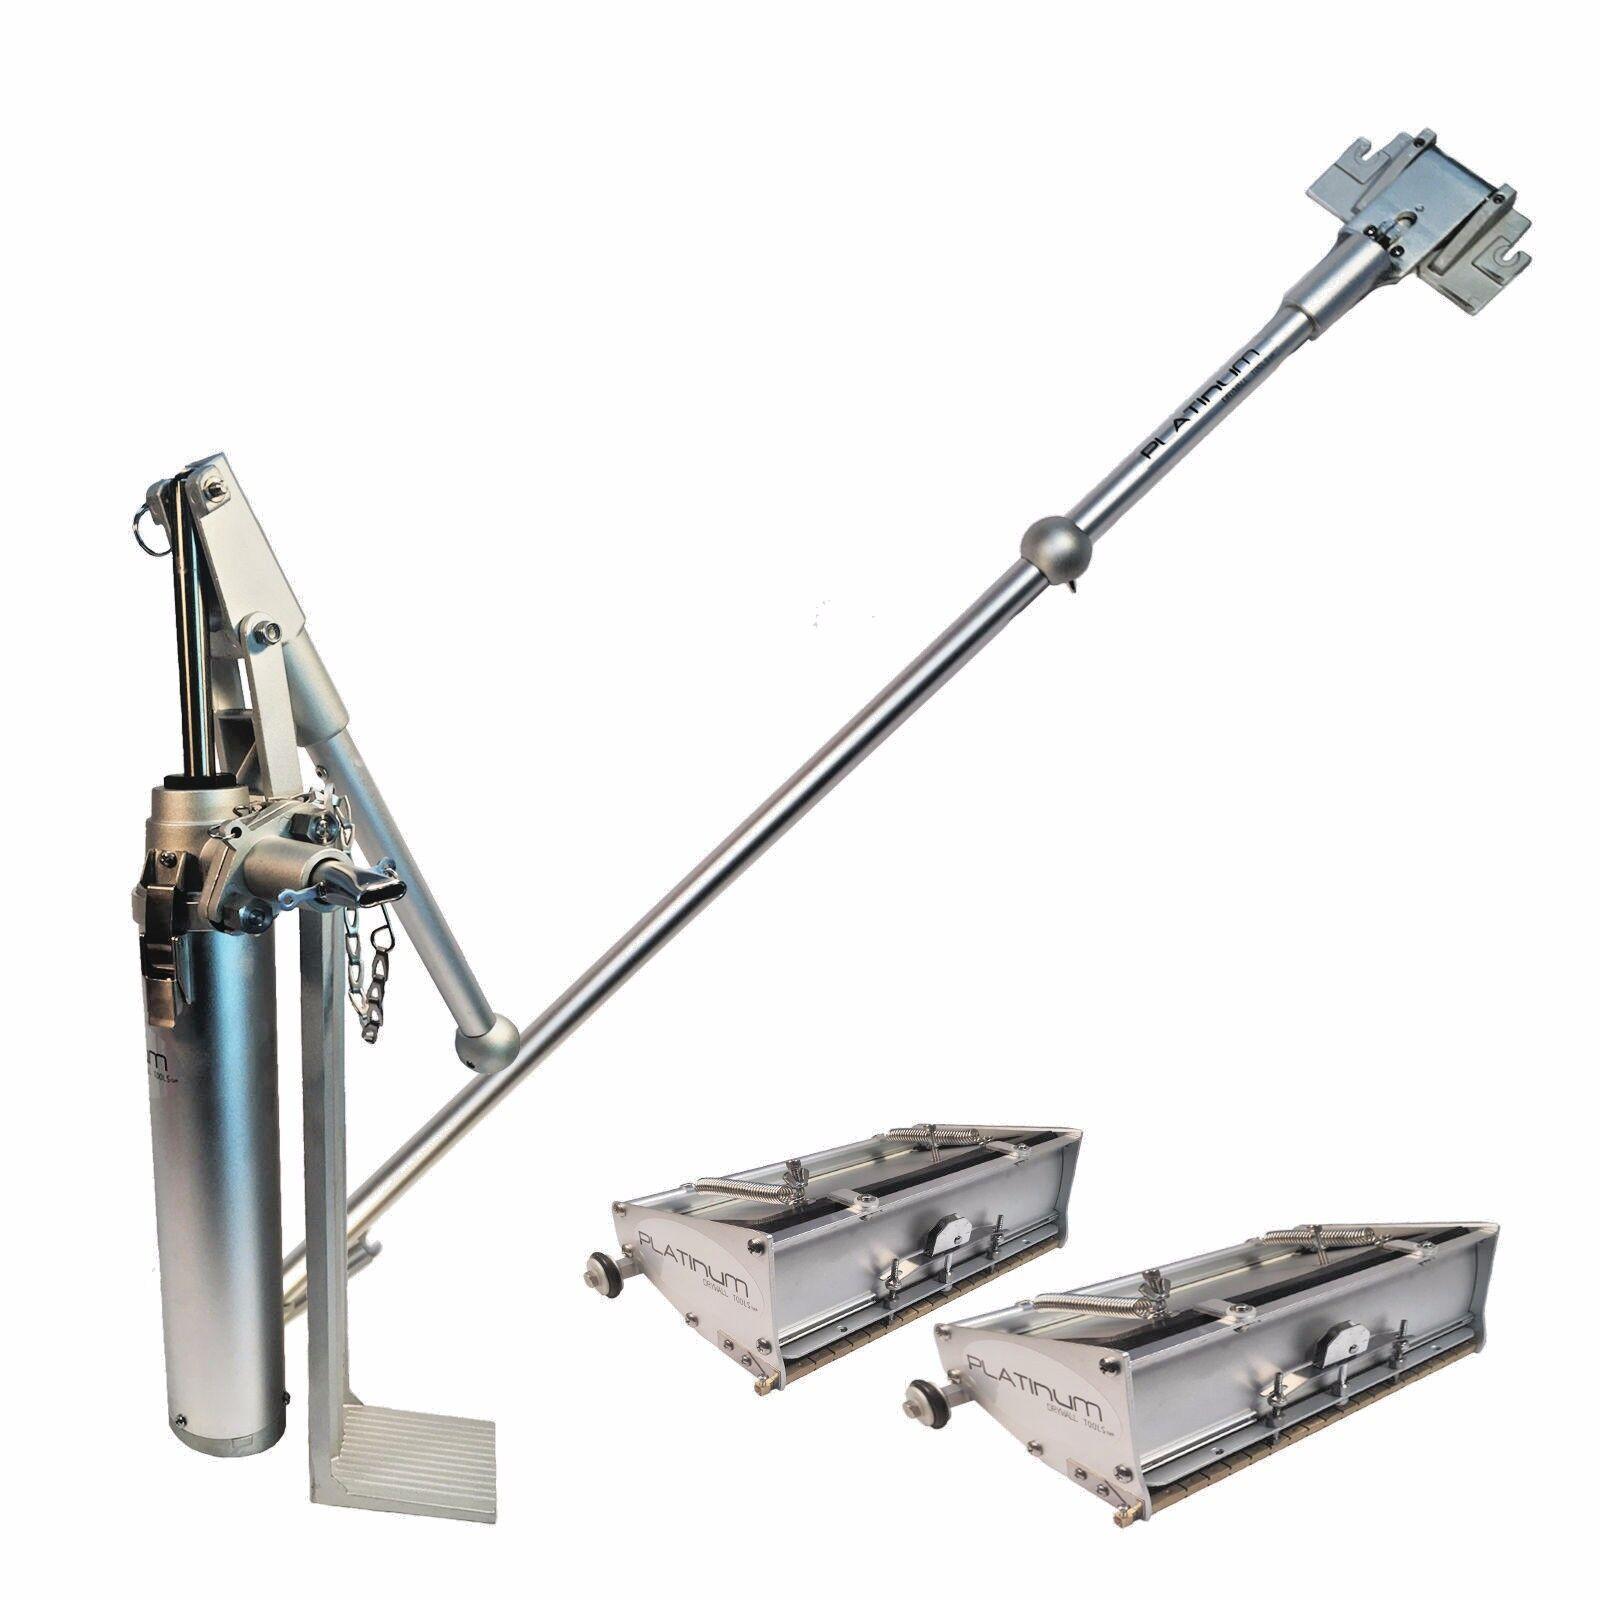 Platinum Drywall Tools Flat Box Set with 10 & 12 inch Boxes, Handle, Pump